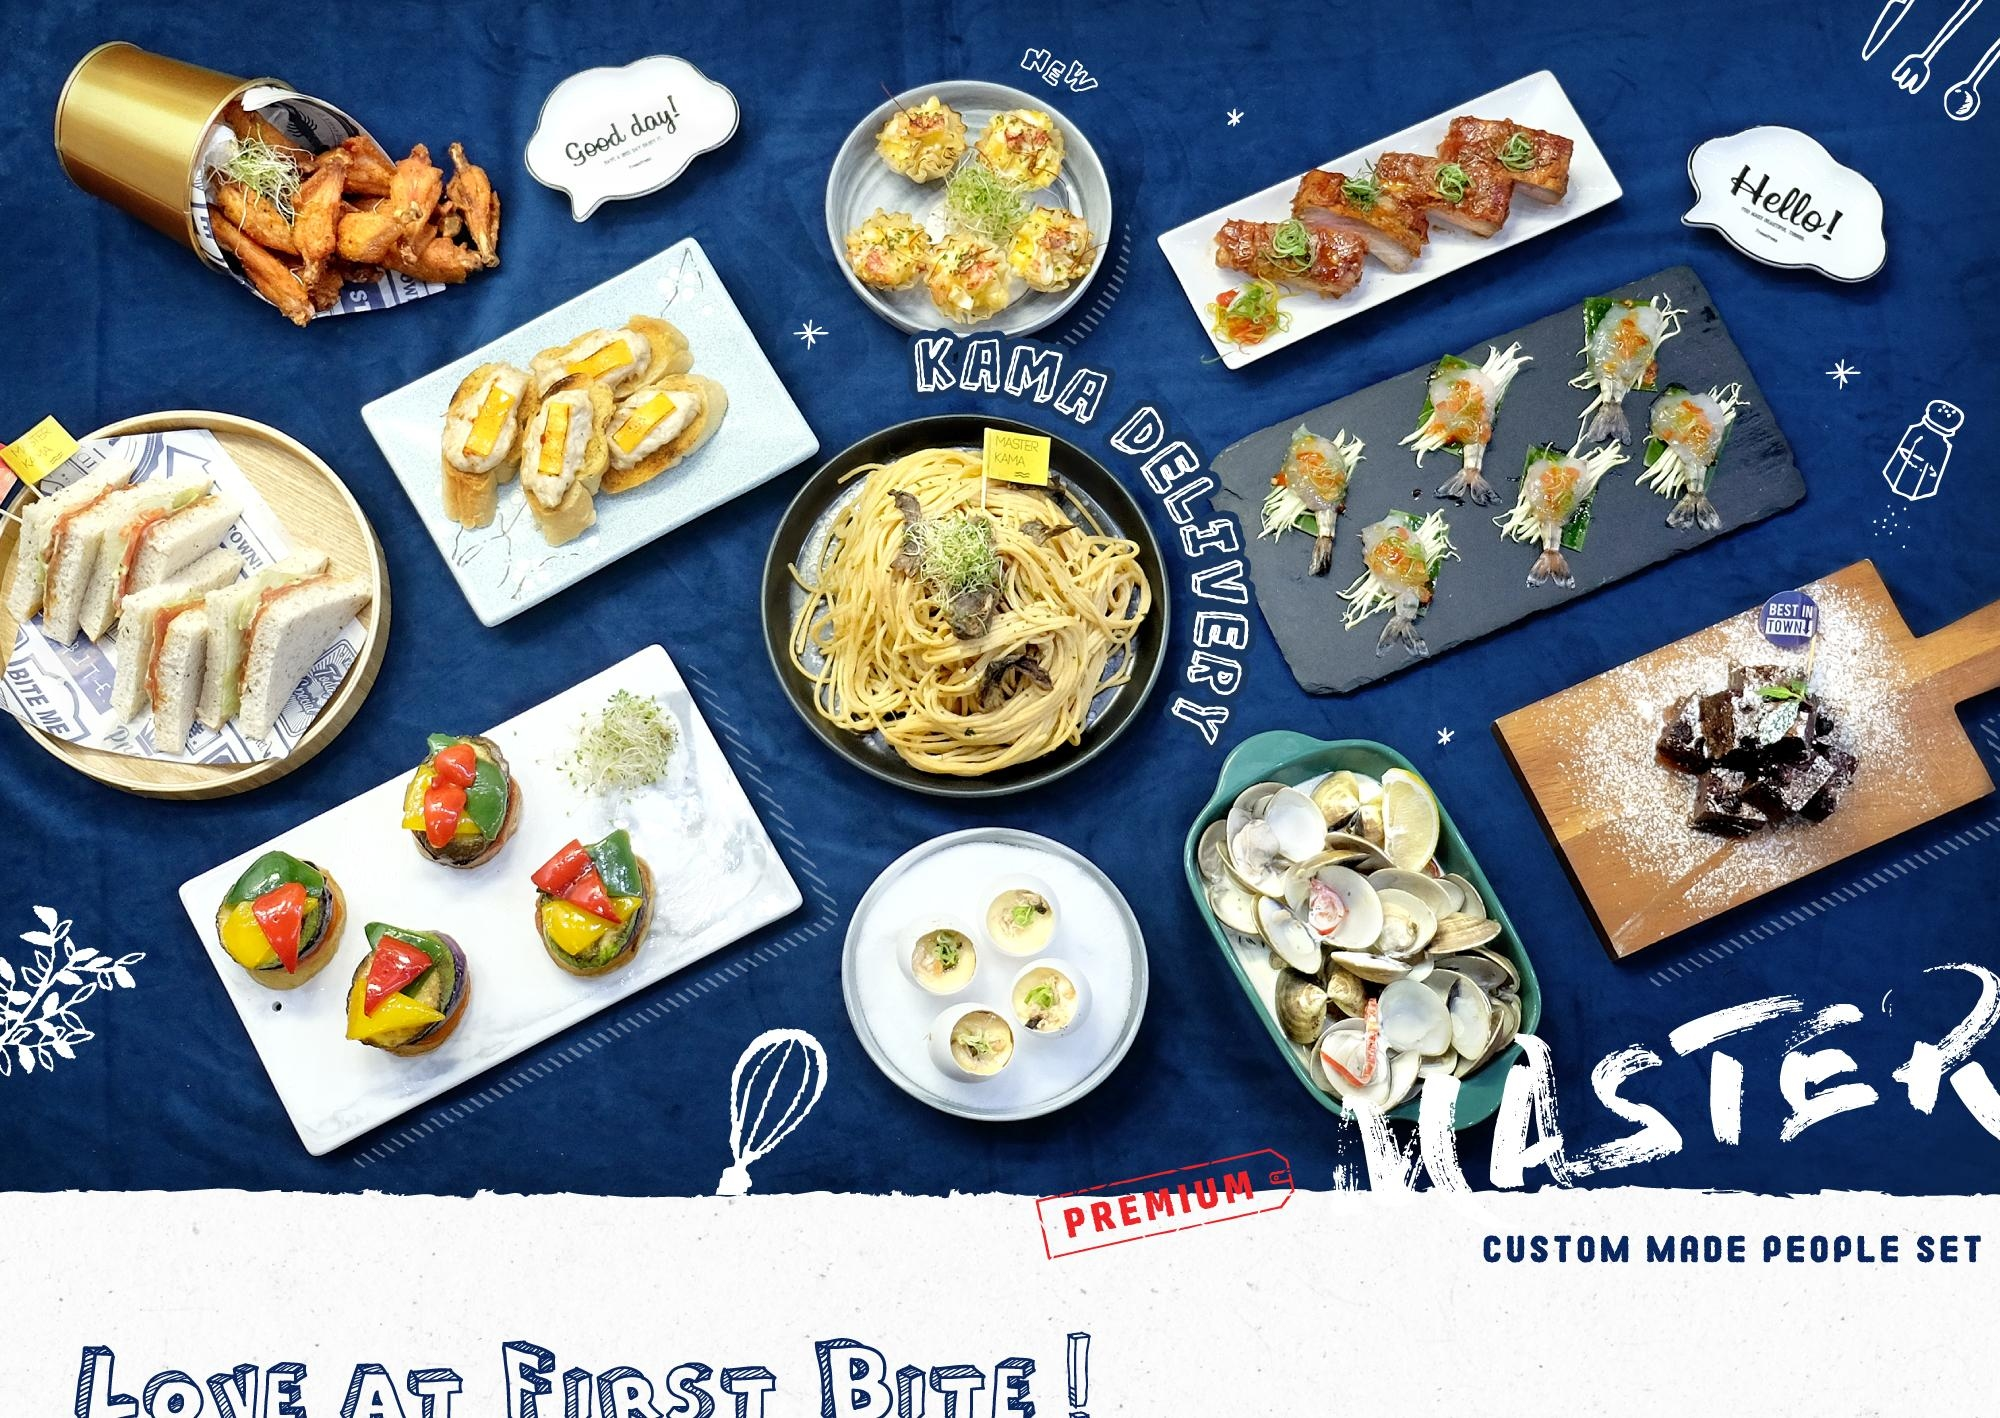 【新推出】Premium Master自選人數的到會套餐|Kama Delivery美食到會外賣服務